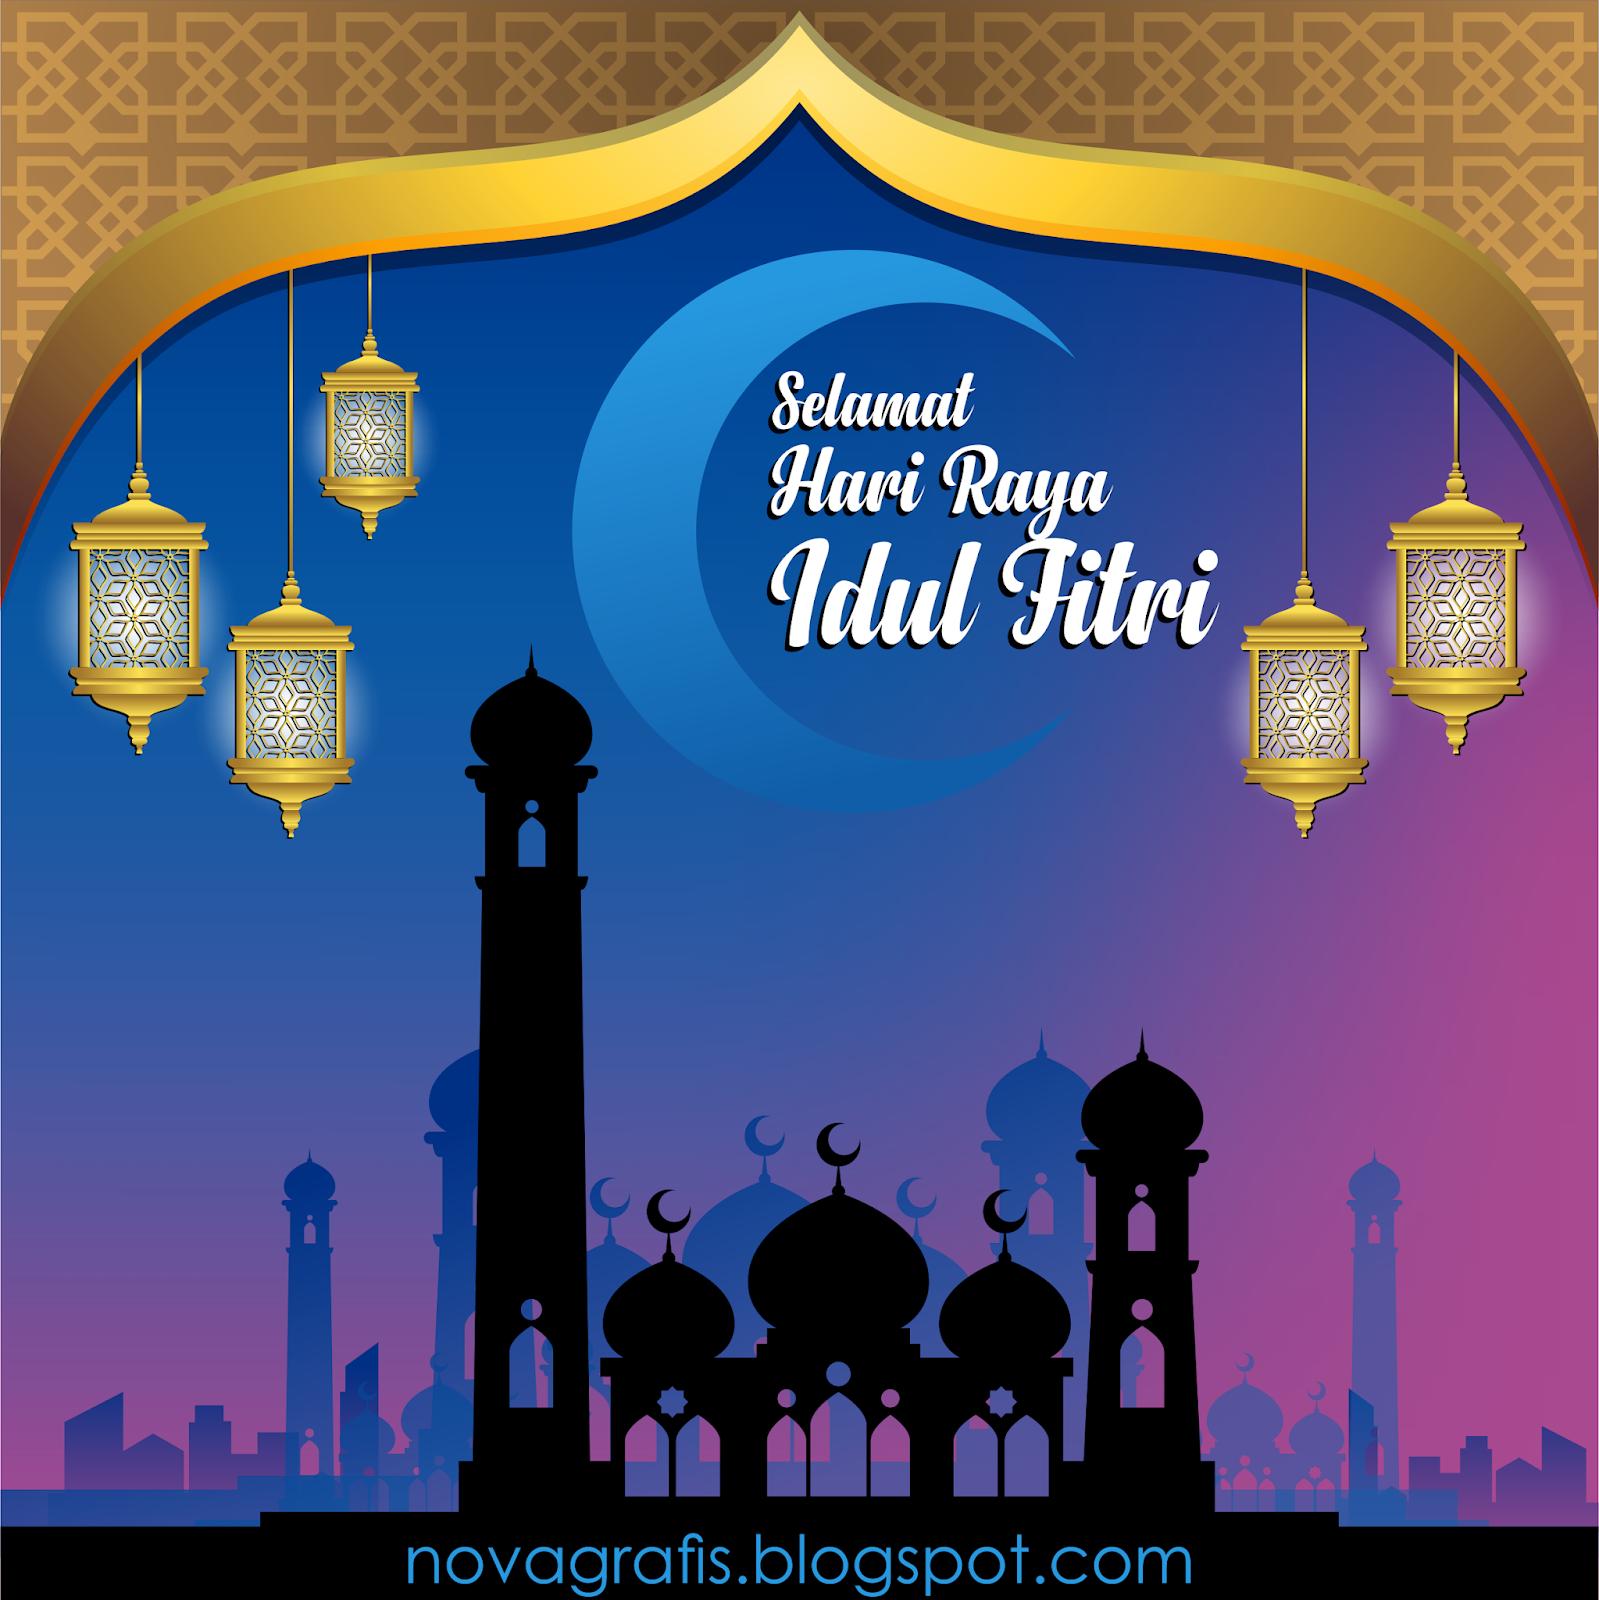 Spanduk Hari Raya Idul Fitri